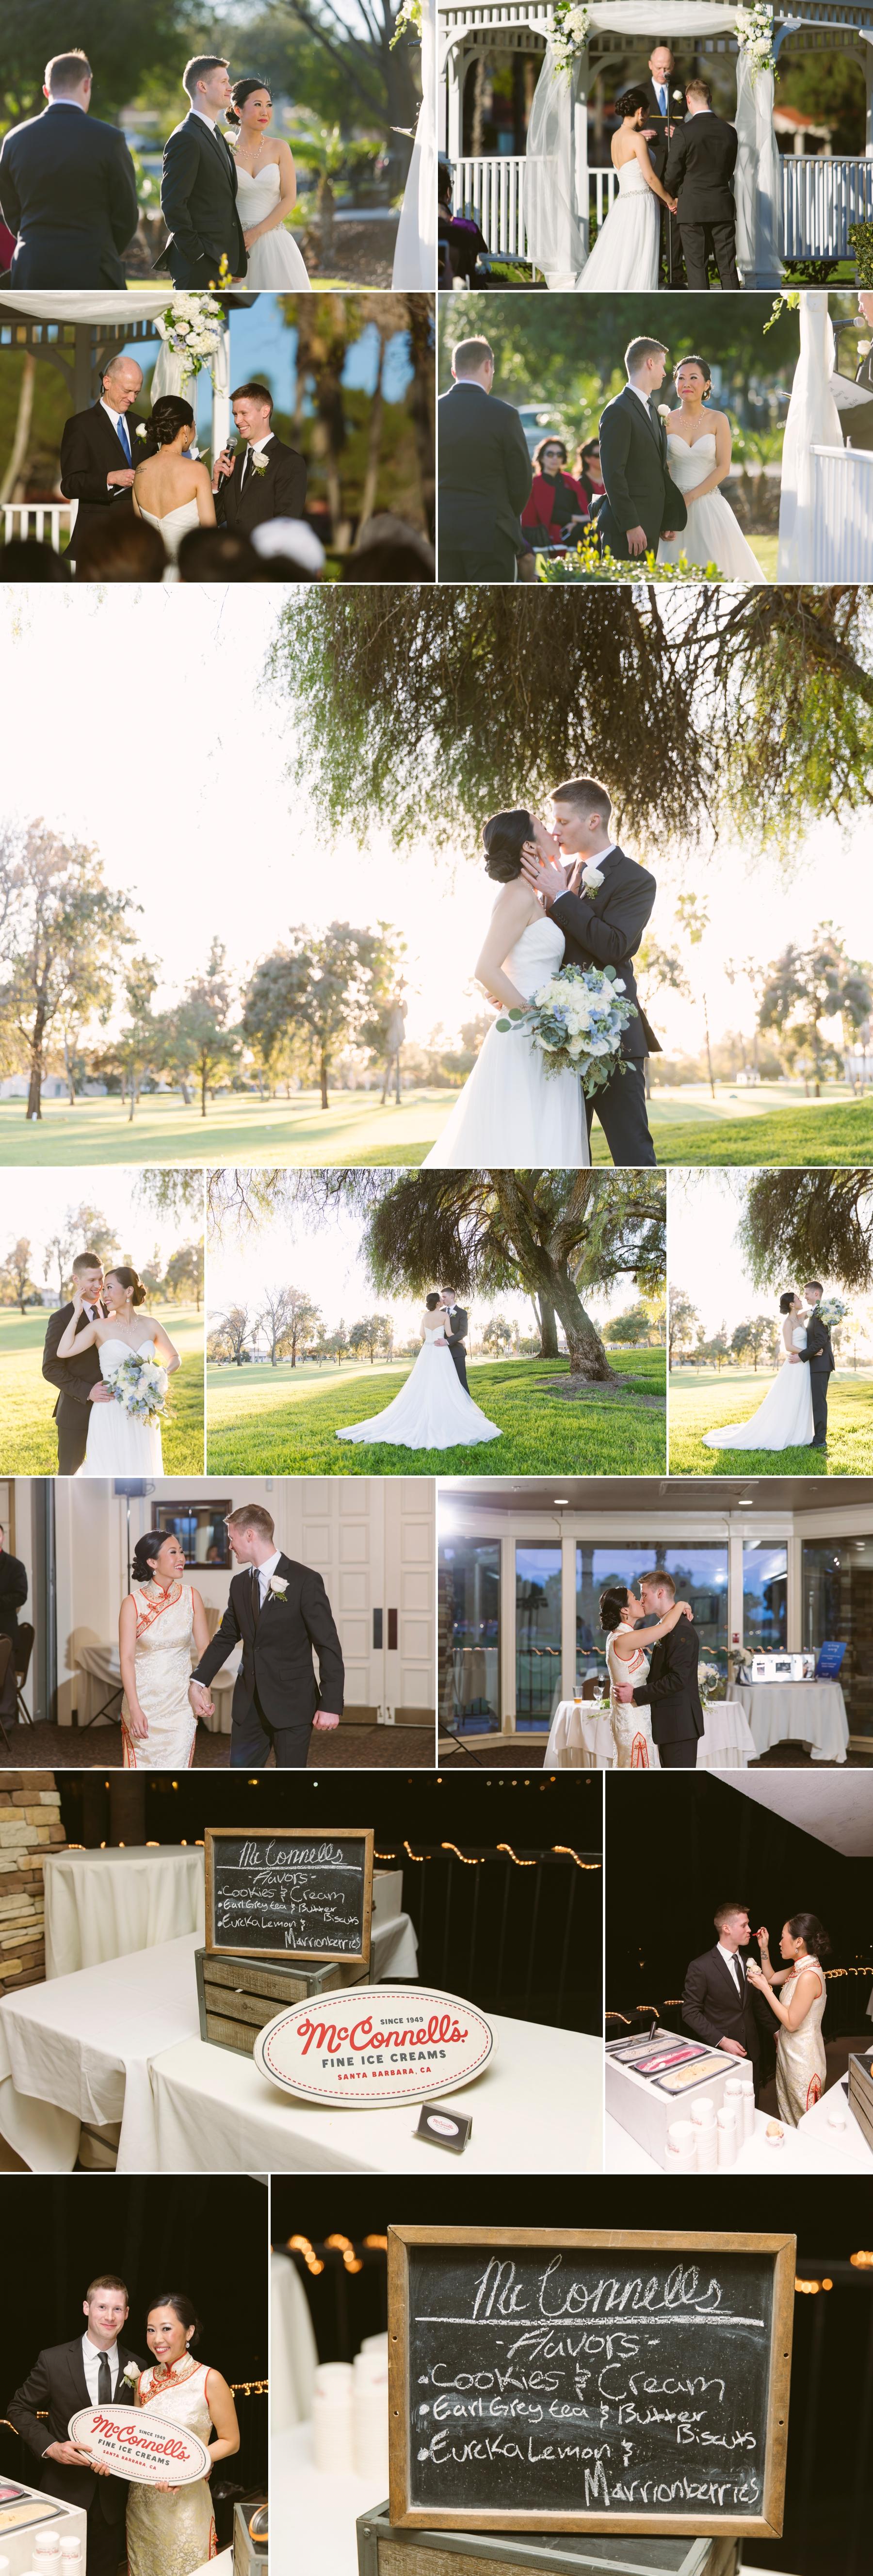 affordable-wedding-photography-orange-county-wedgewood-upland-hills-wedding-shy-heart-studios-2